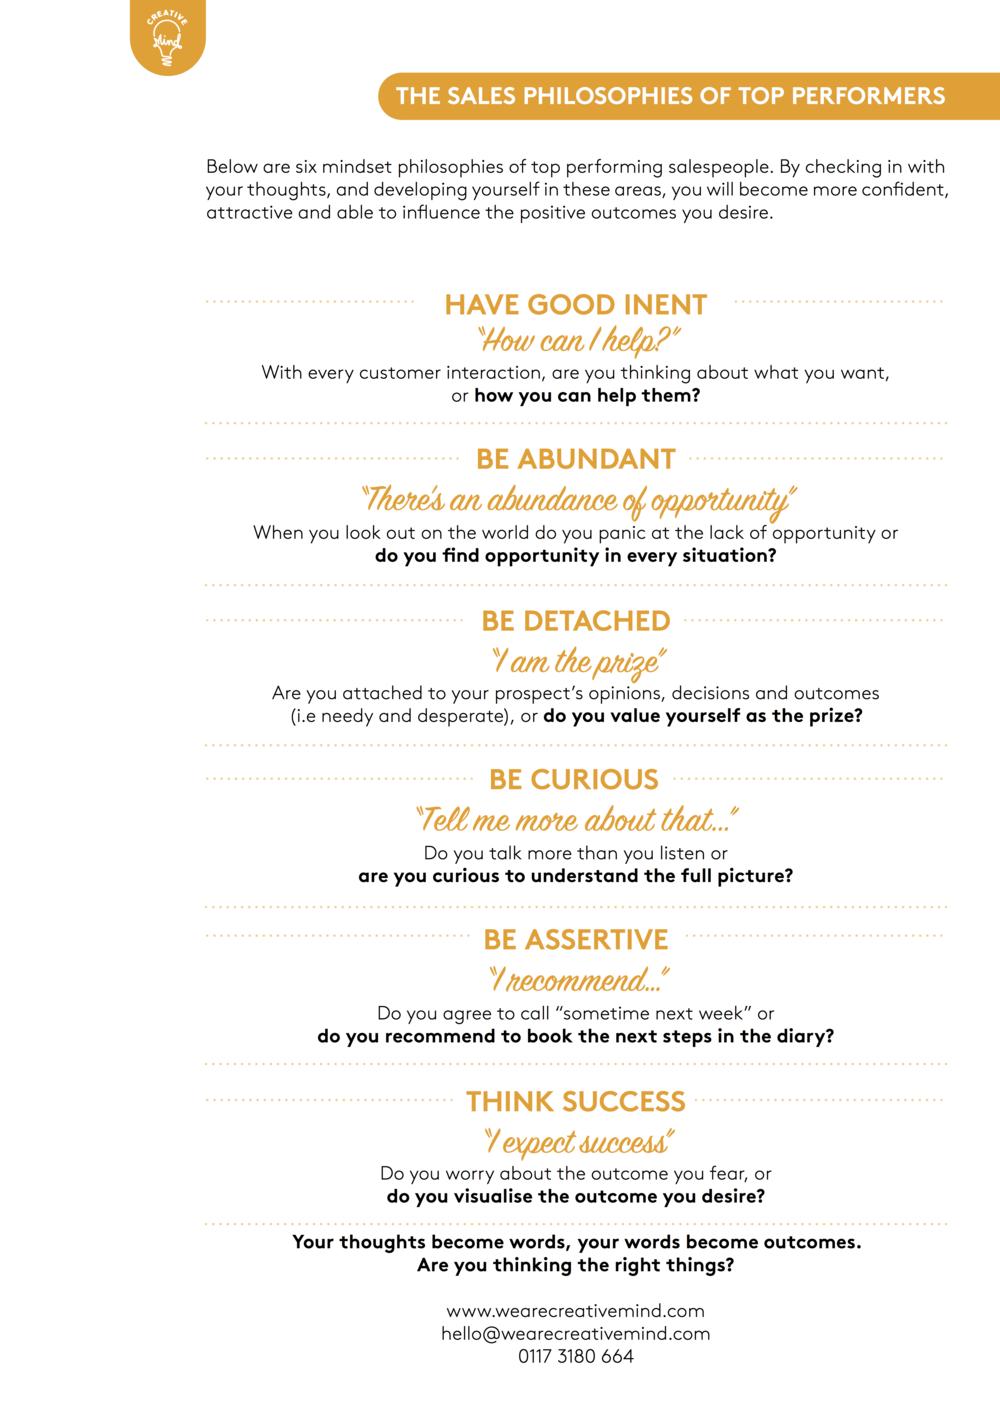 CreativeMind_6 Sales Philosophies.png